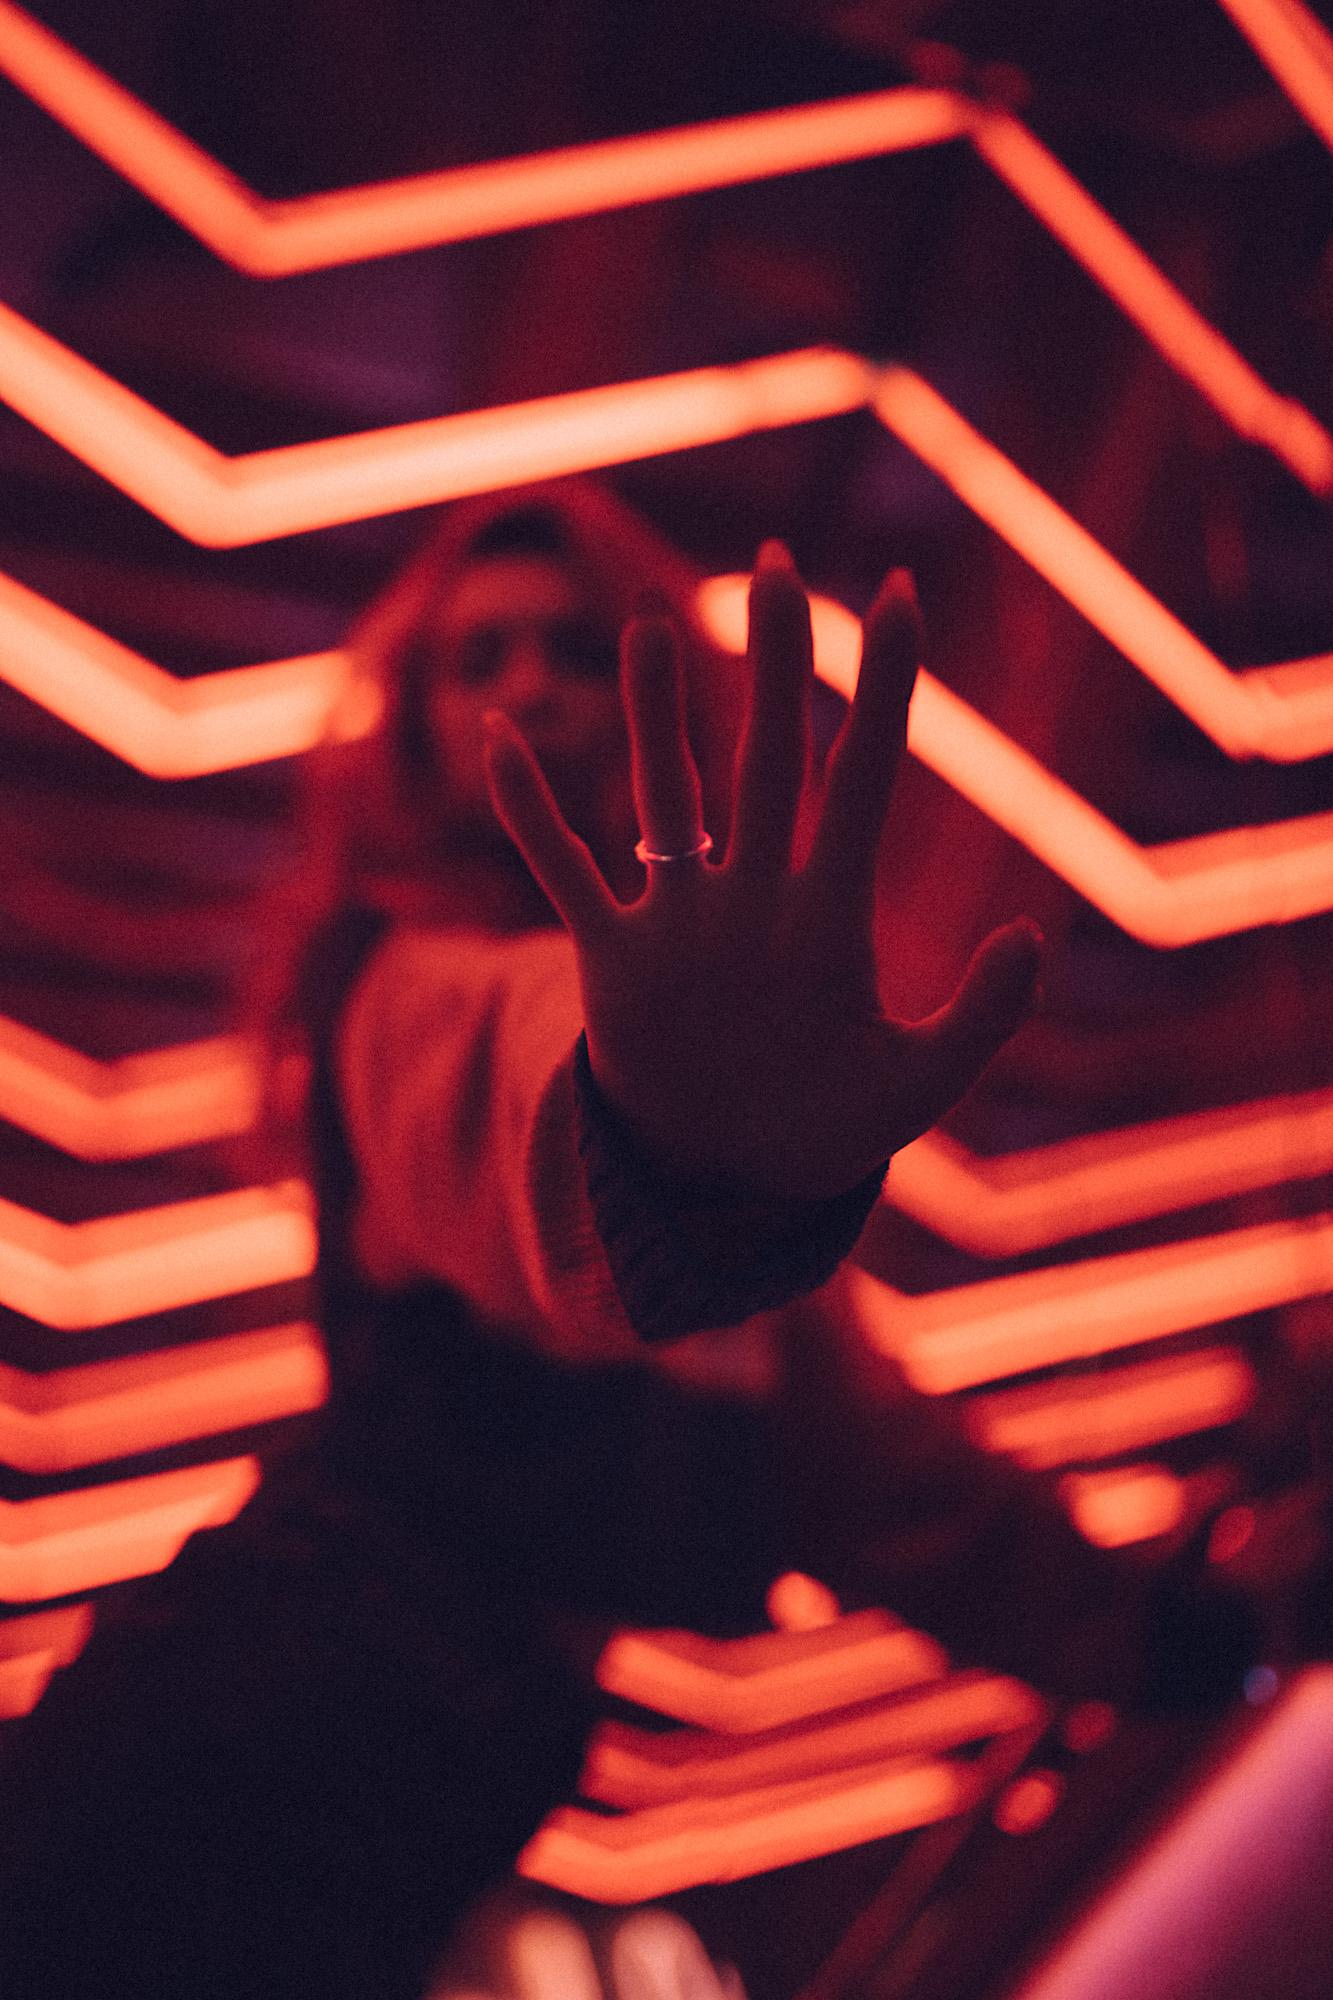 Neon-Giulia-web-4.jpg